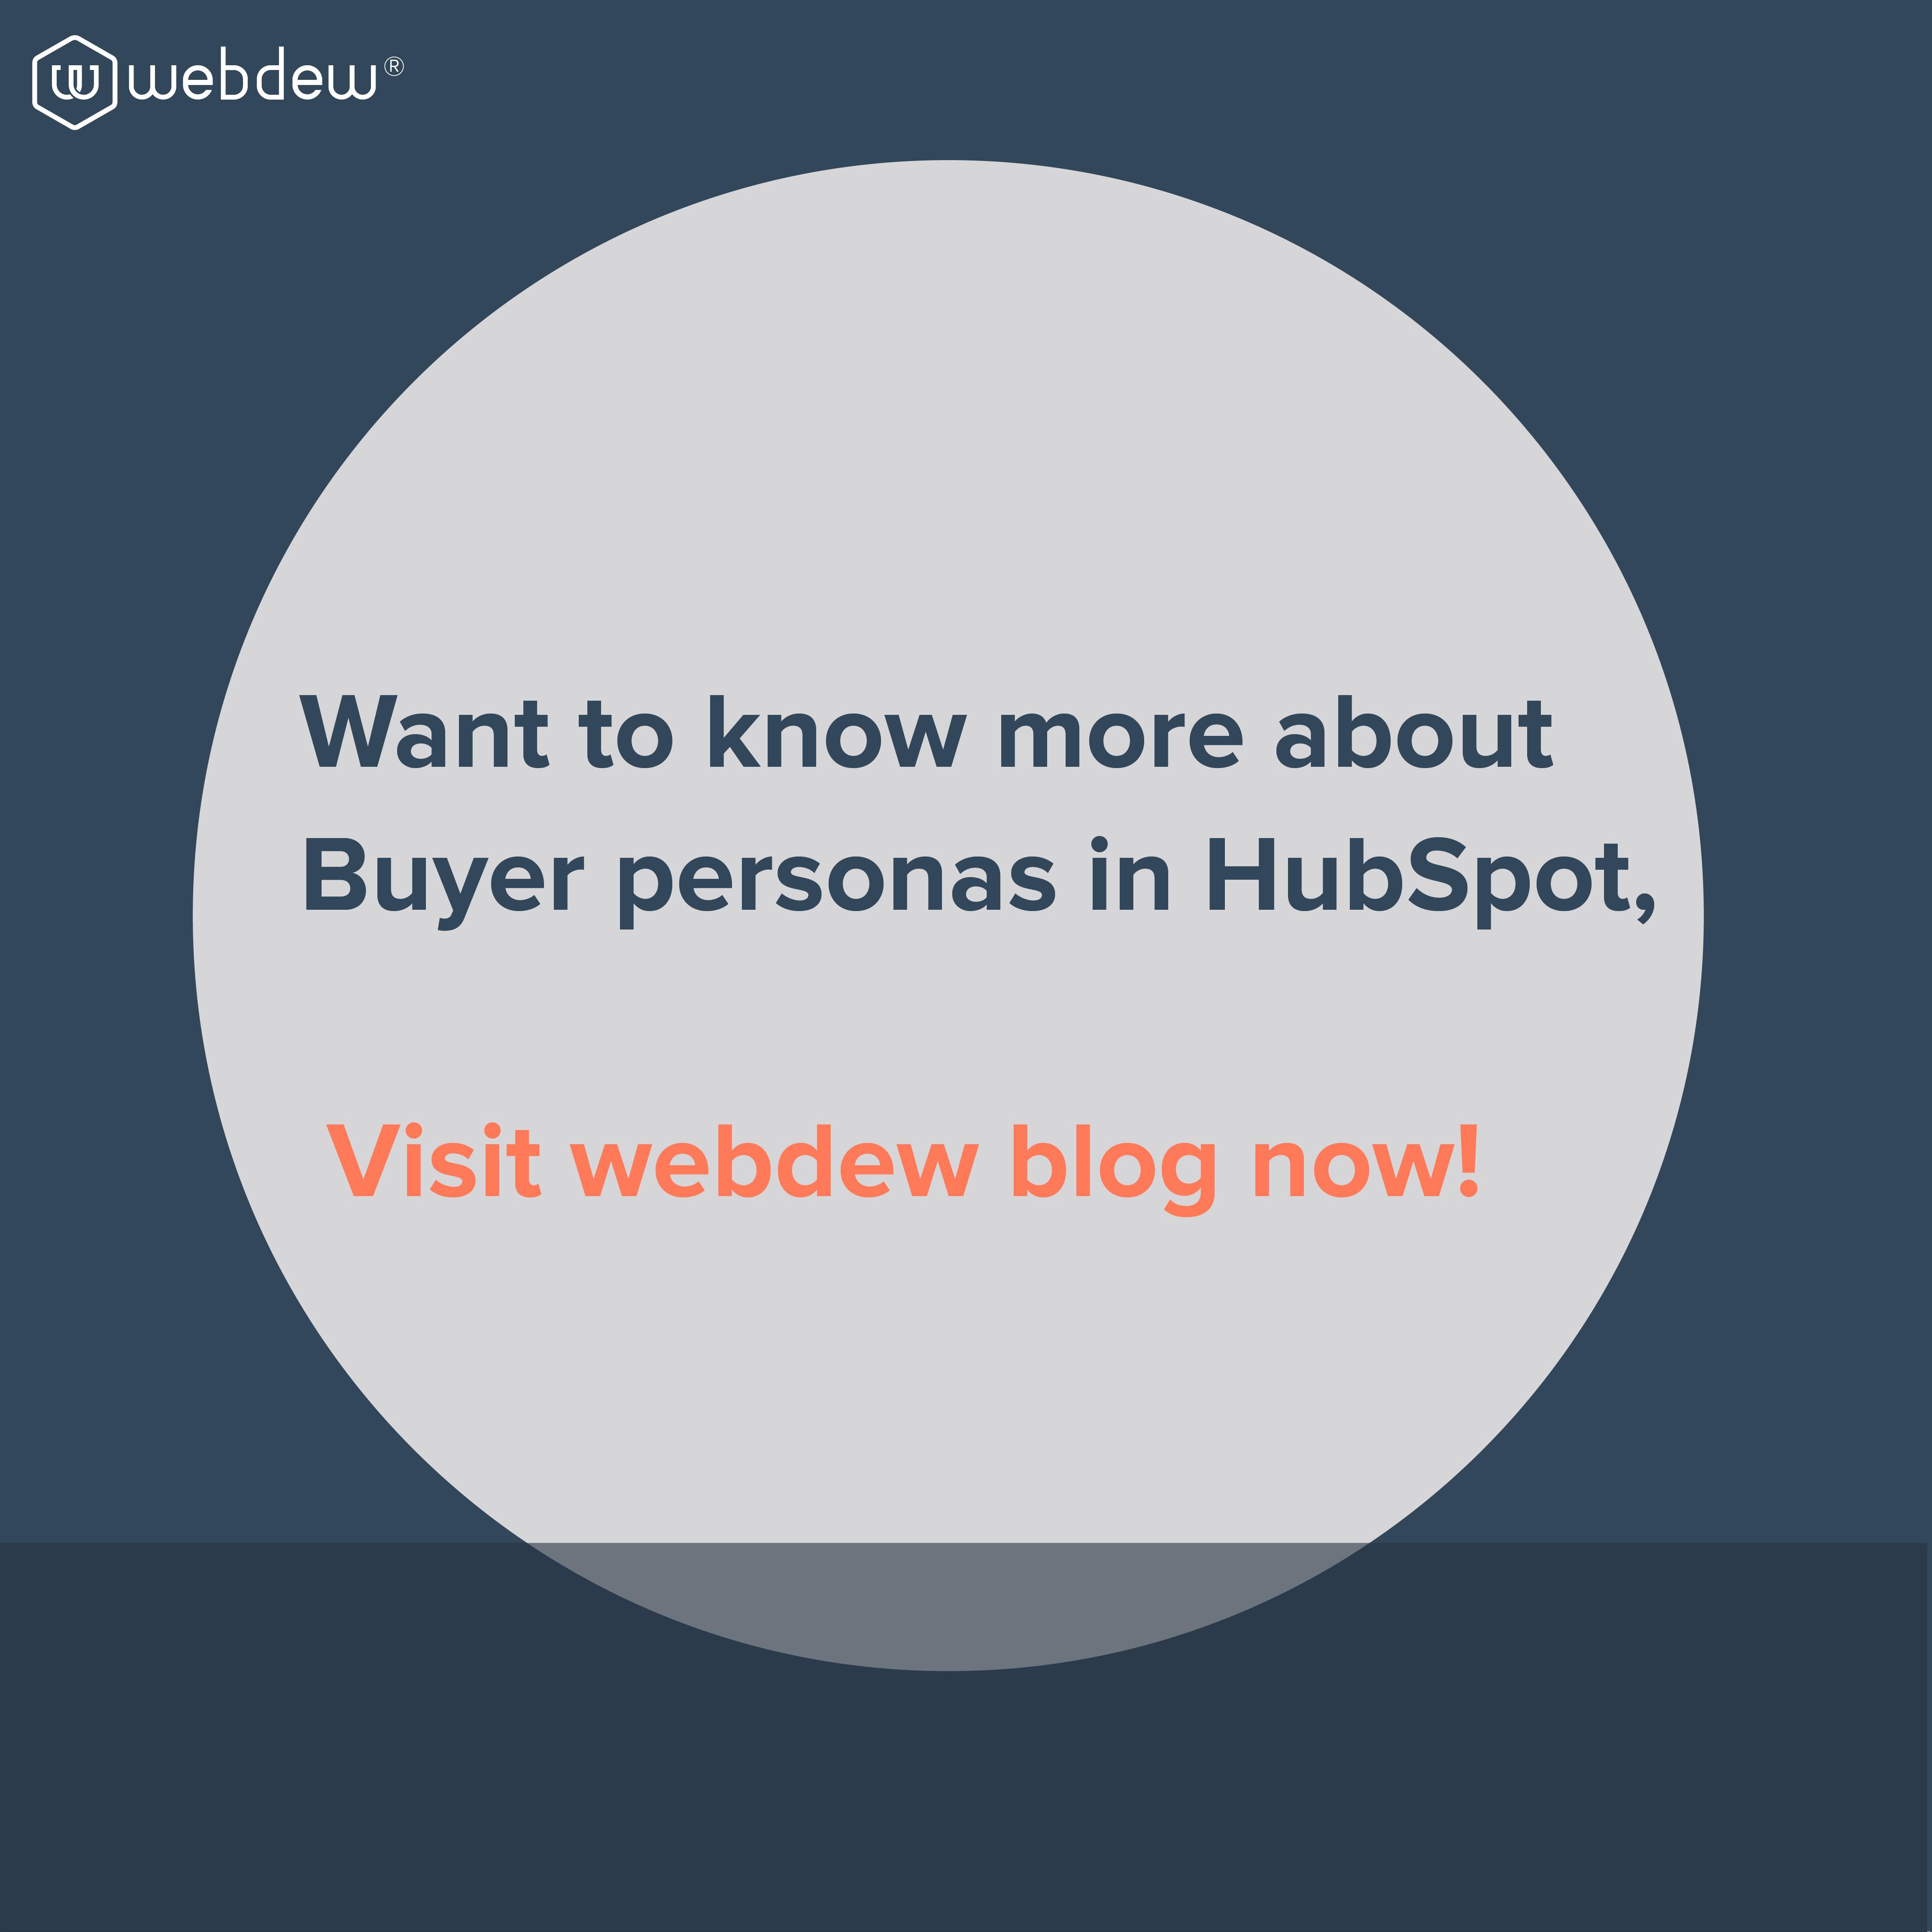 6 visit webdew blog now